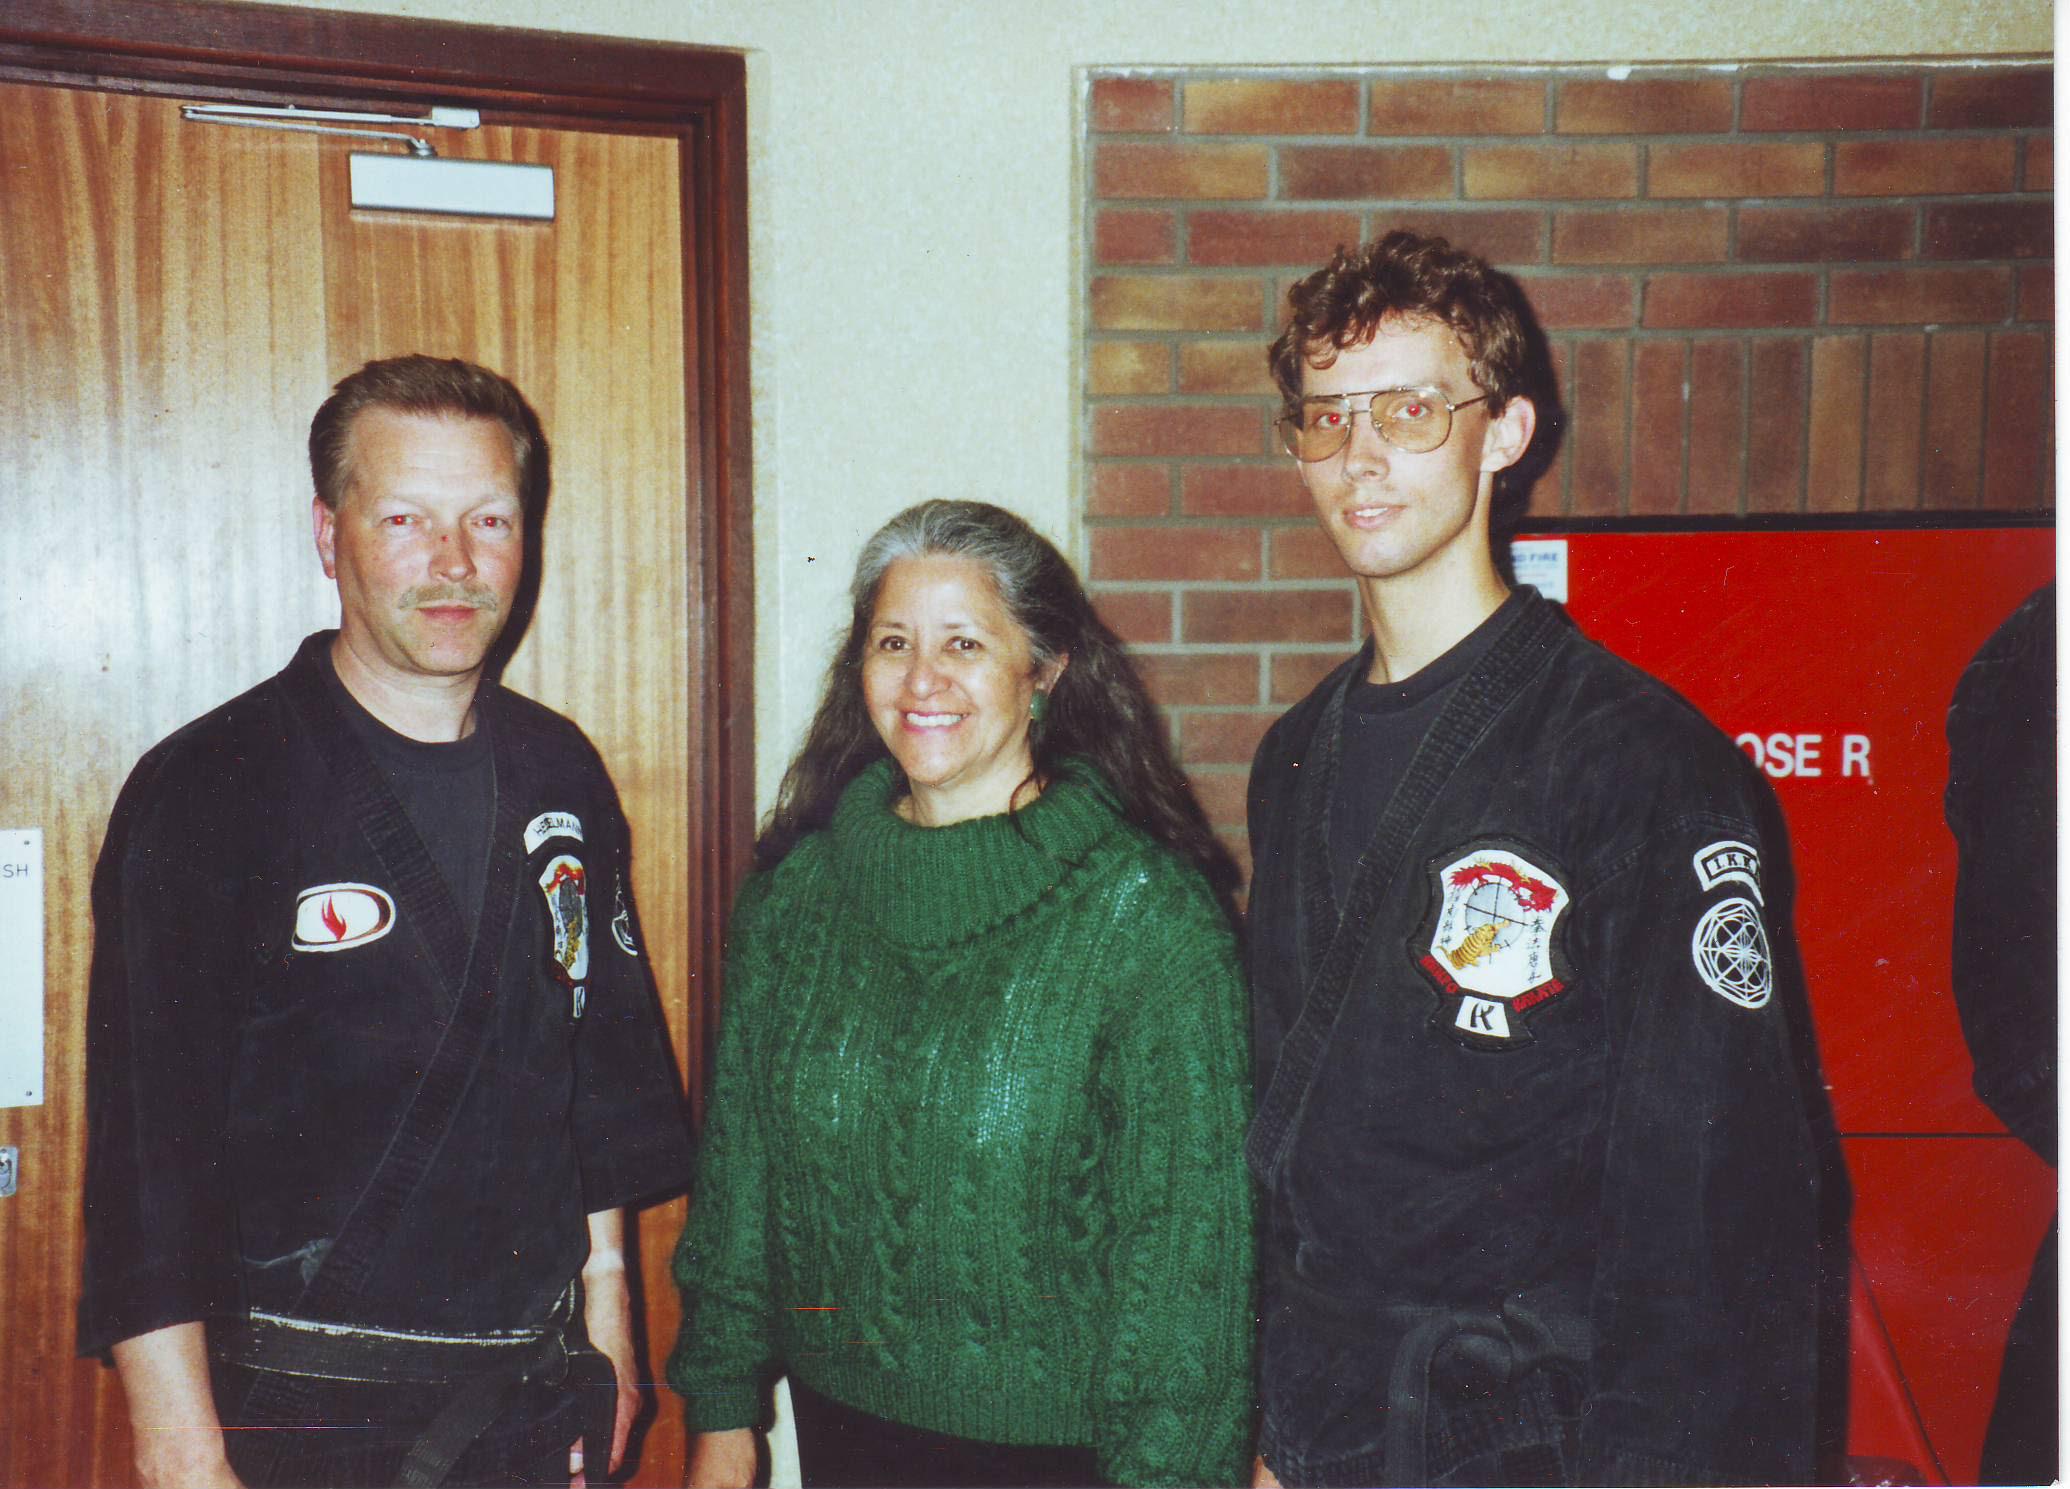 1991 Jersey C.I. Hesselmann, Leilani Parker, Erik Branger